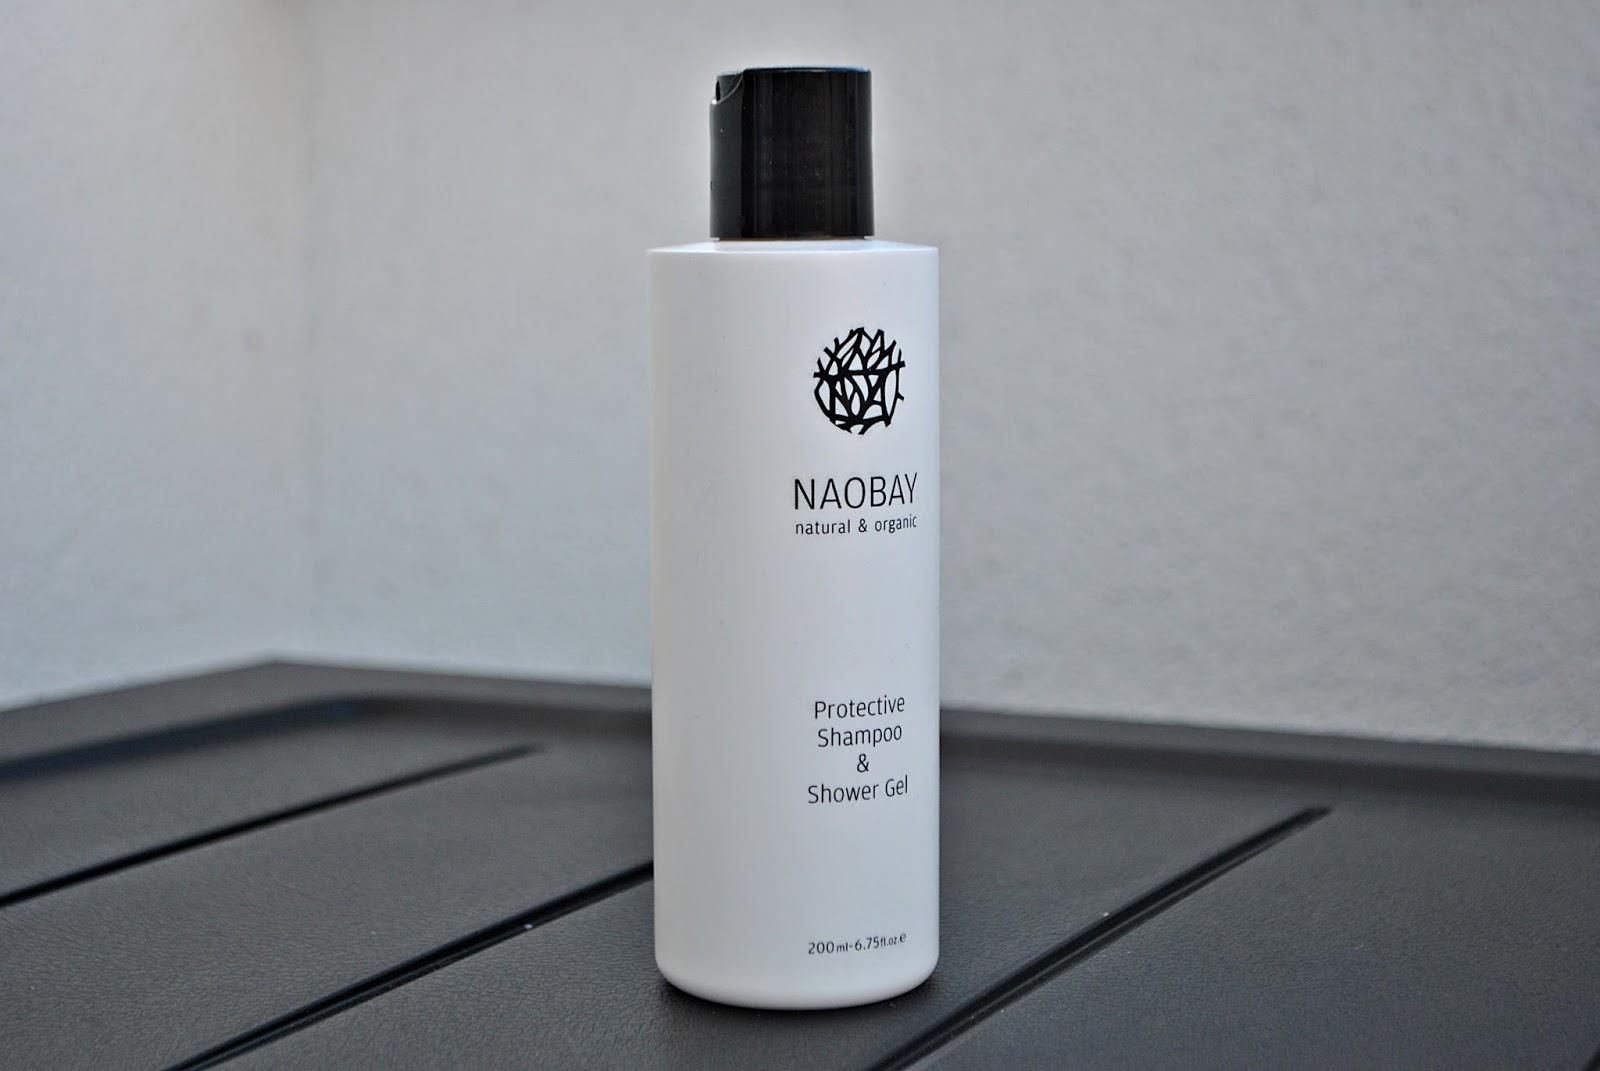 Naobay natural & organic szampon i żel pod prysznic